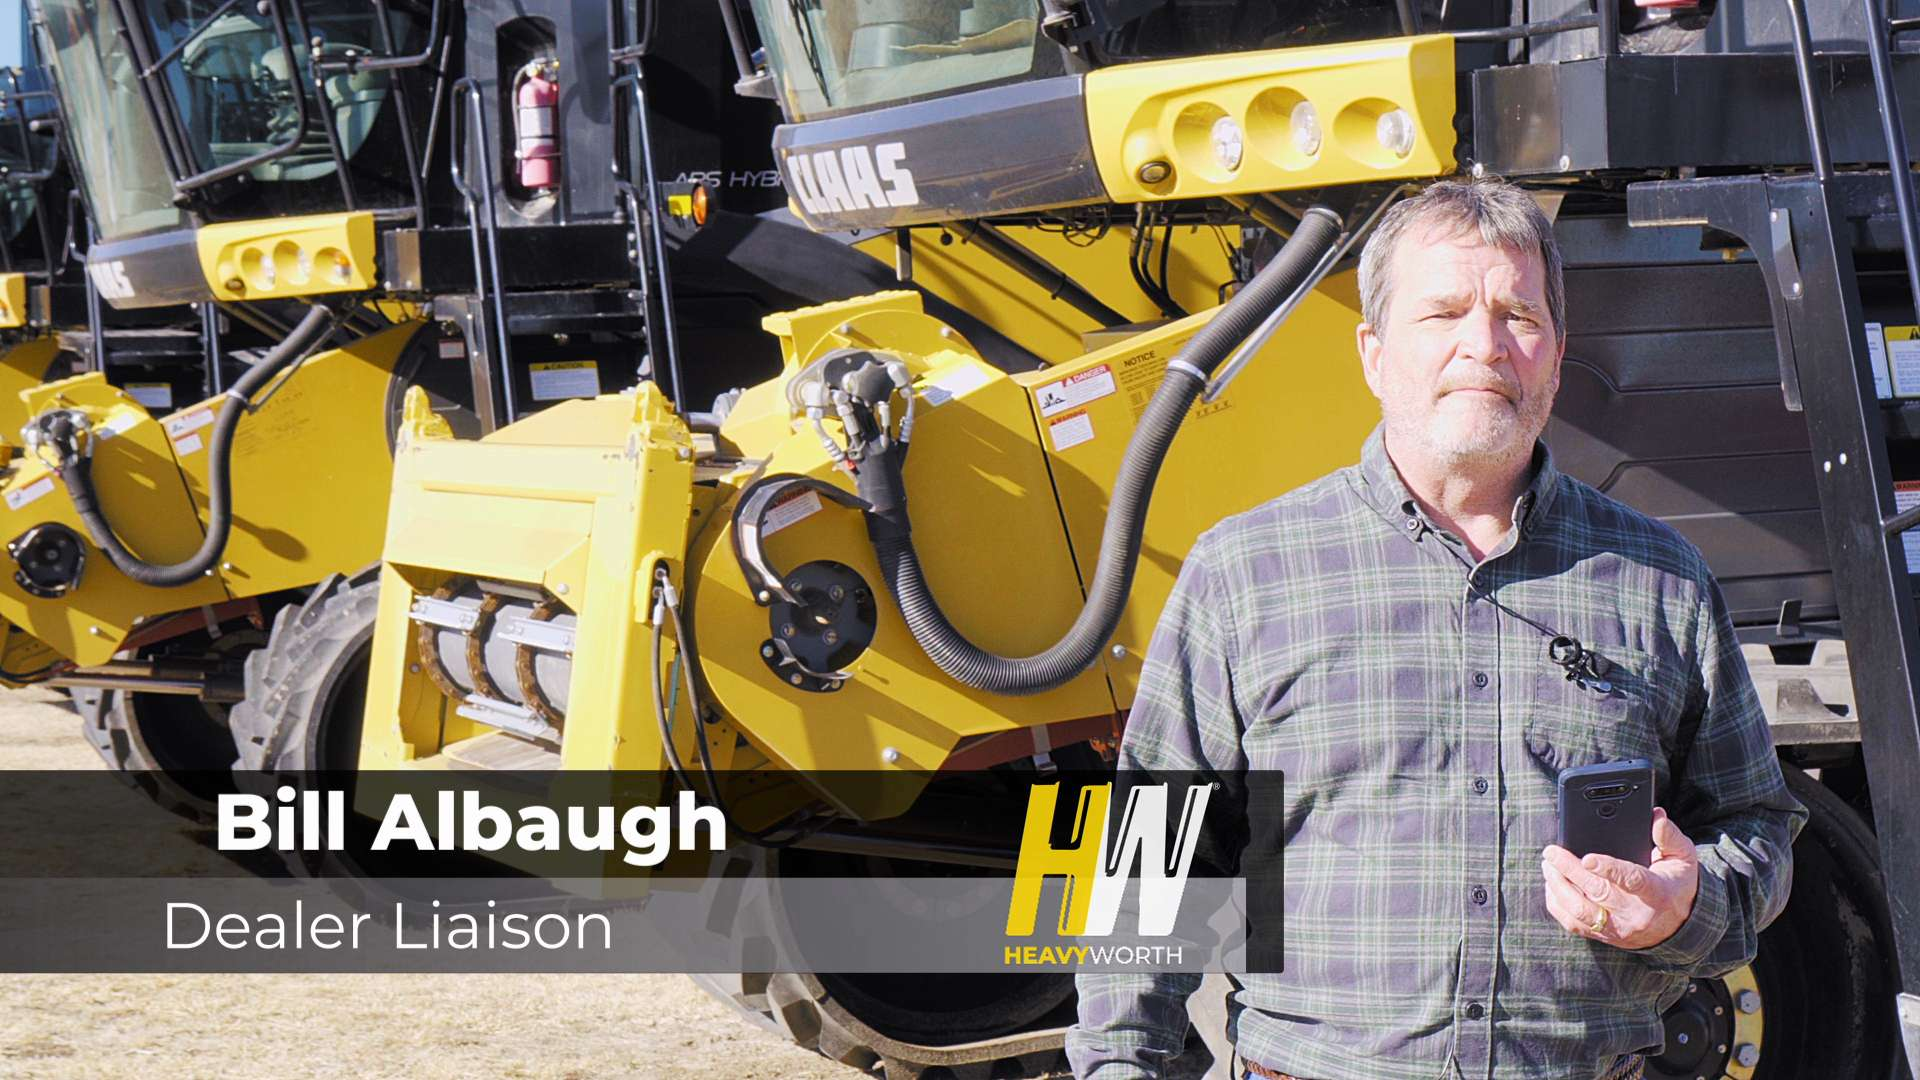 Bill Albaugh, HeavyWorth's dealer liaison